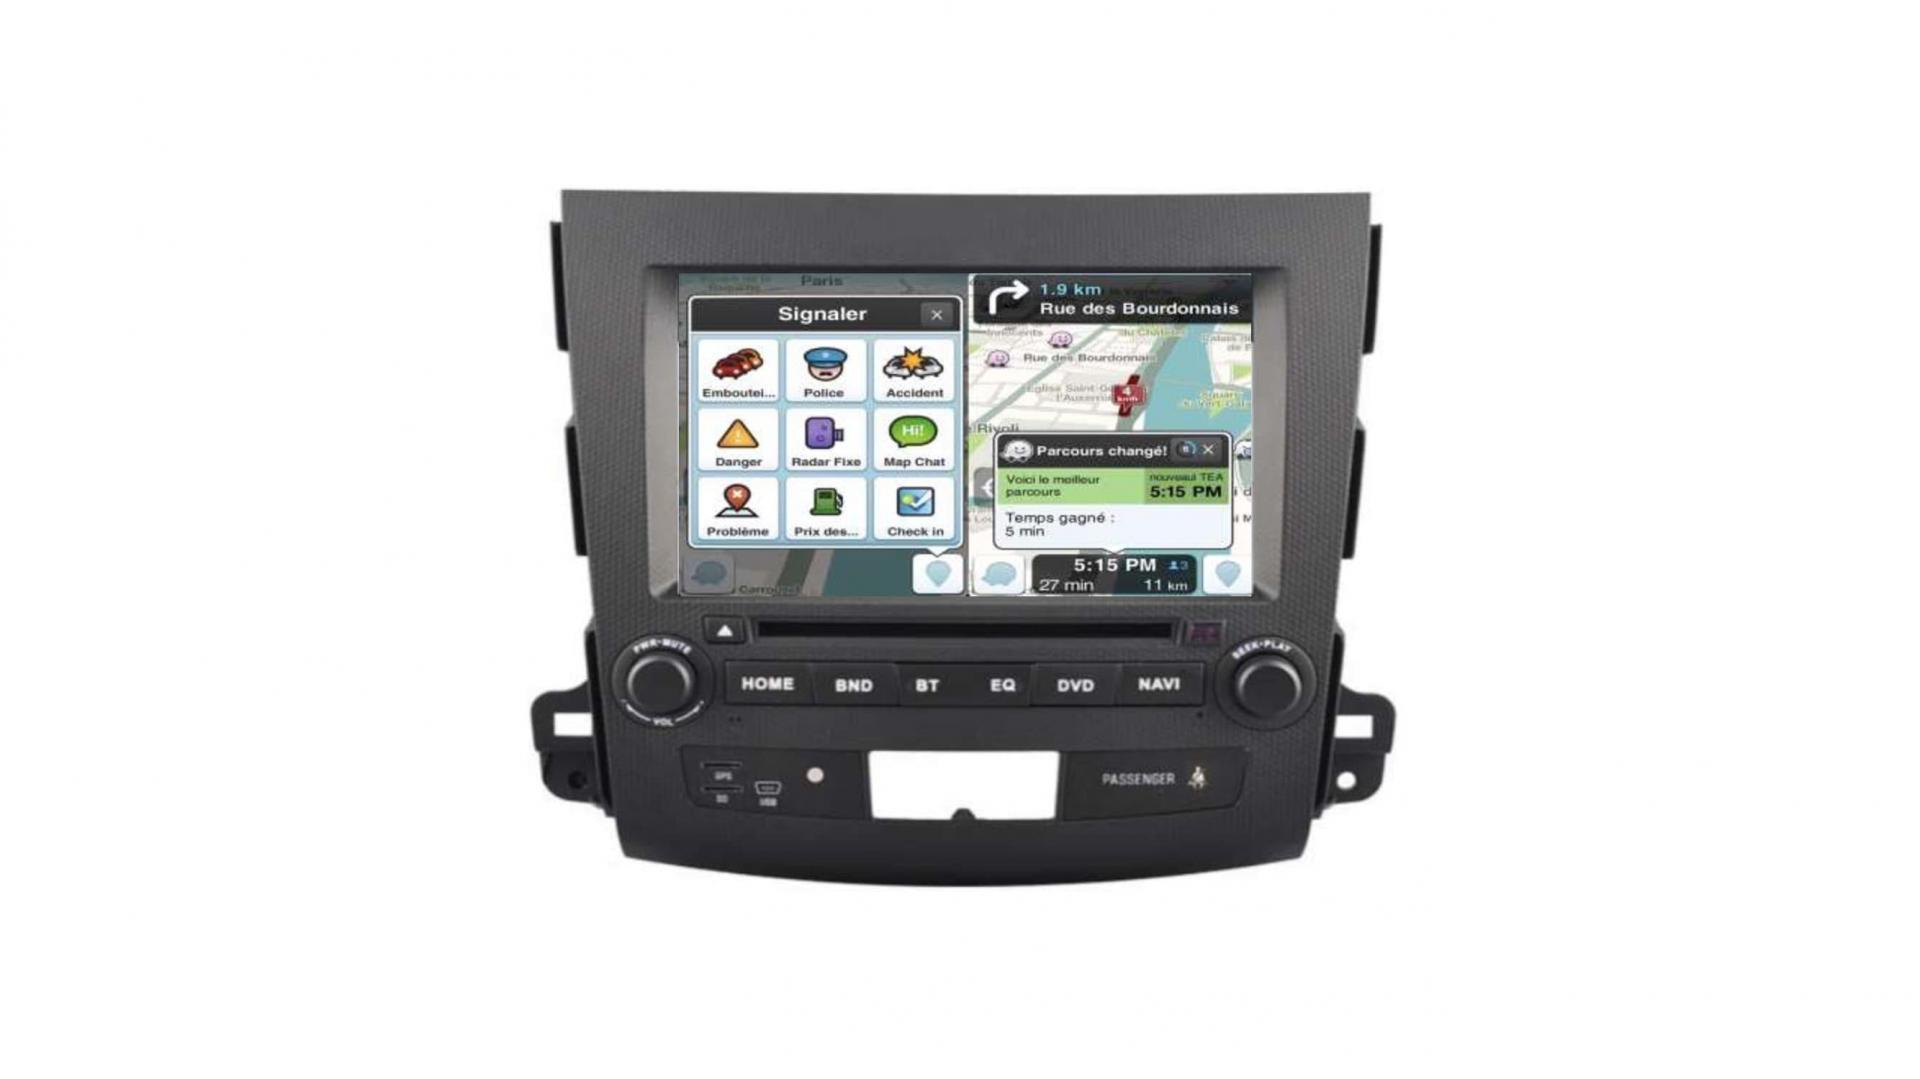 Autoradio gps bluetooth peugeot 4007 android auto carplay camera de recul commande au volant2